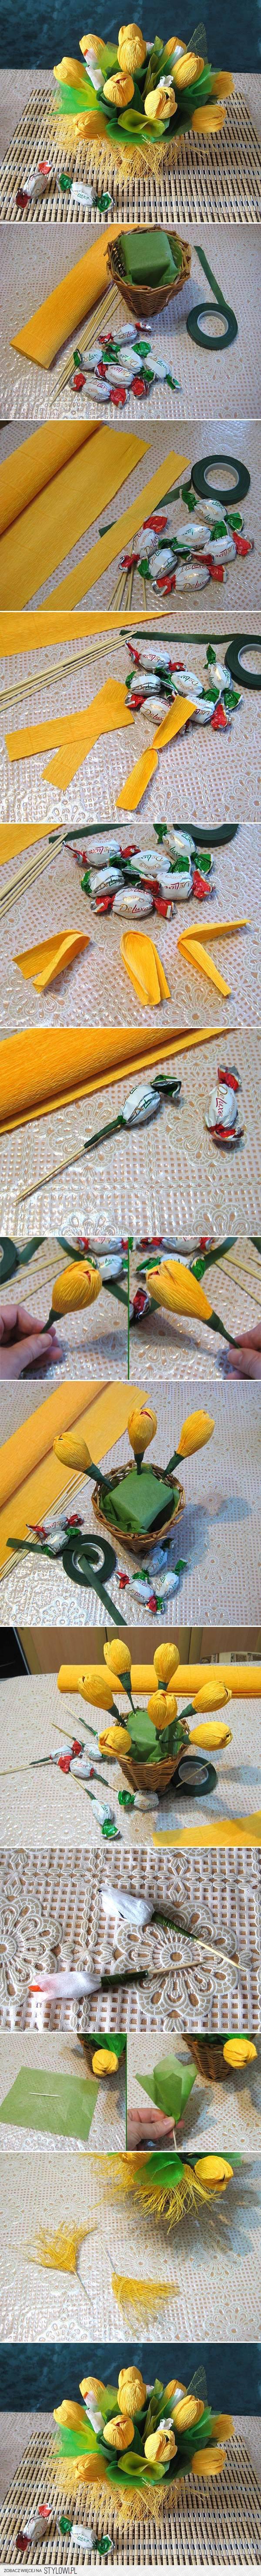 Diy yellow flower candy bouquet diy projects usefuldiu na stylowi